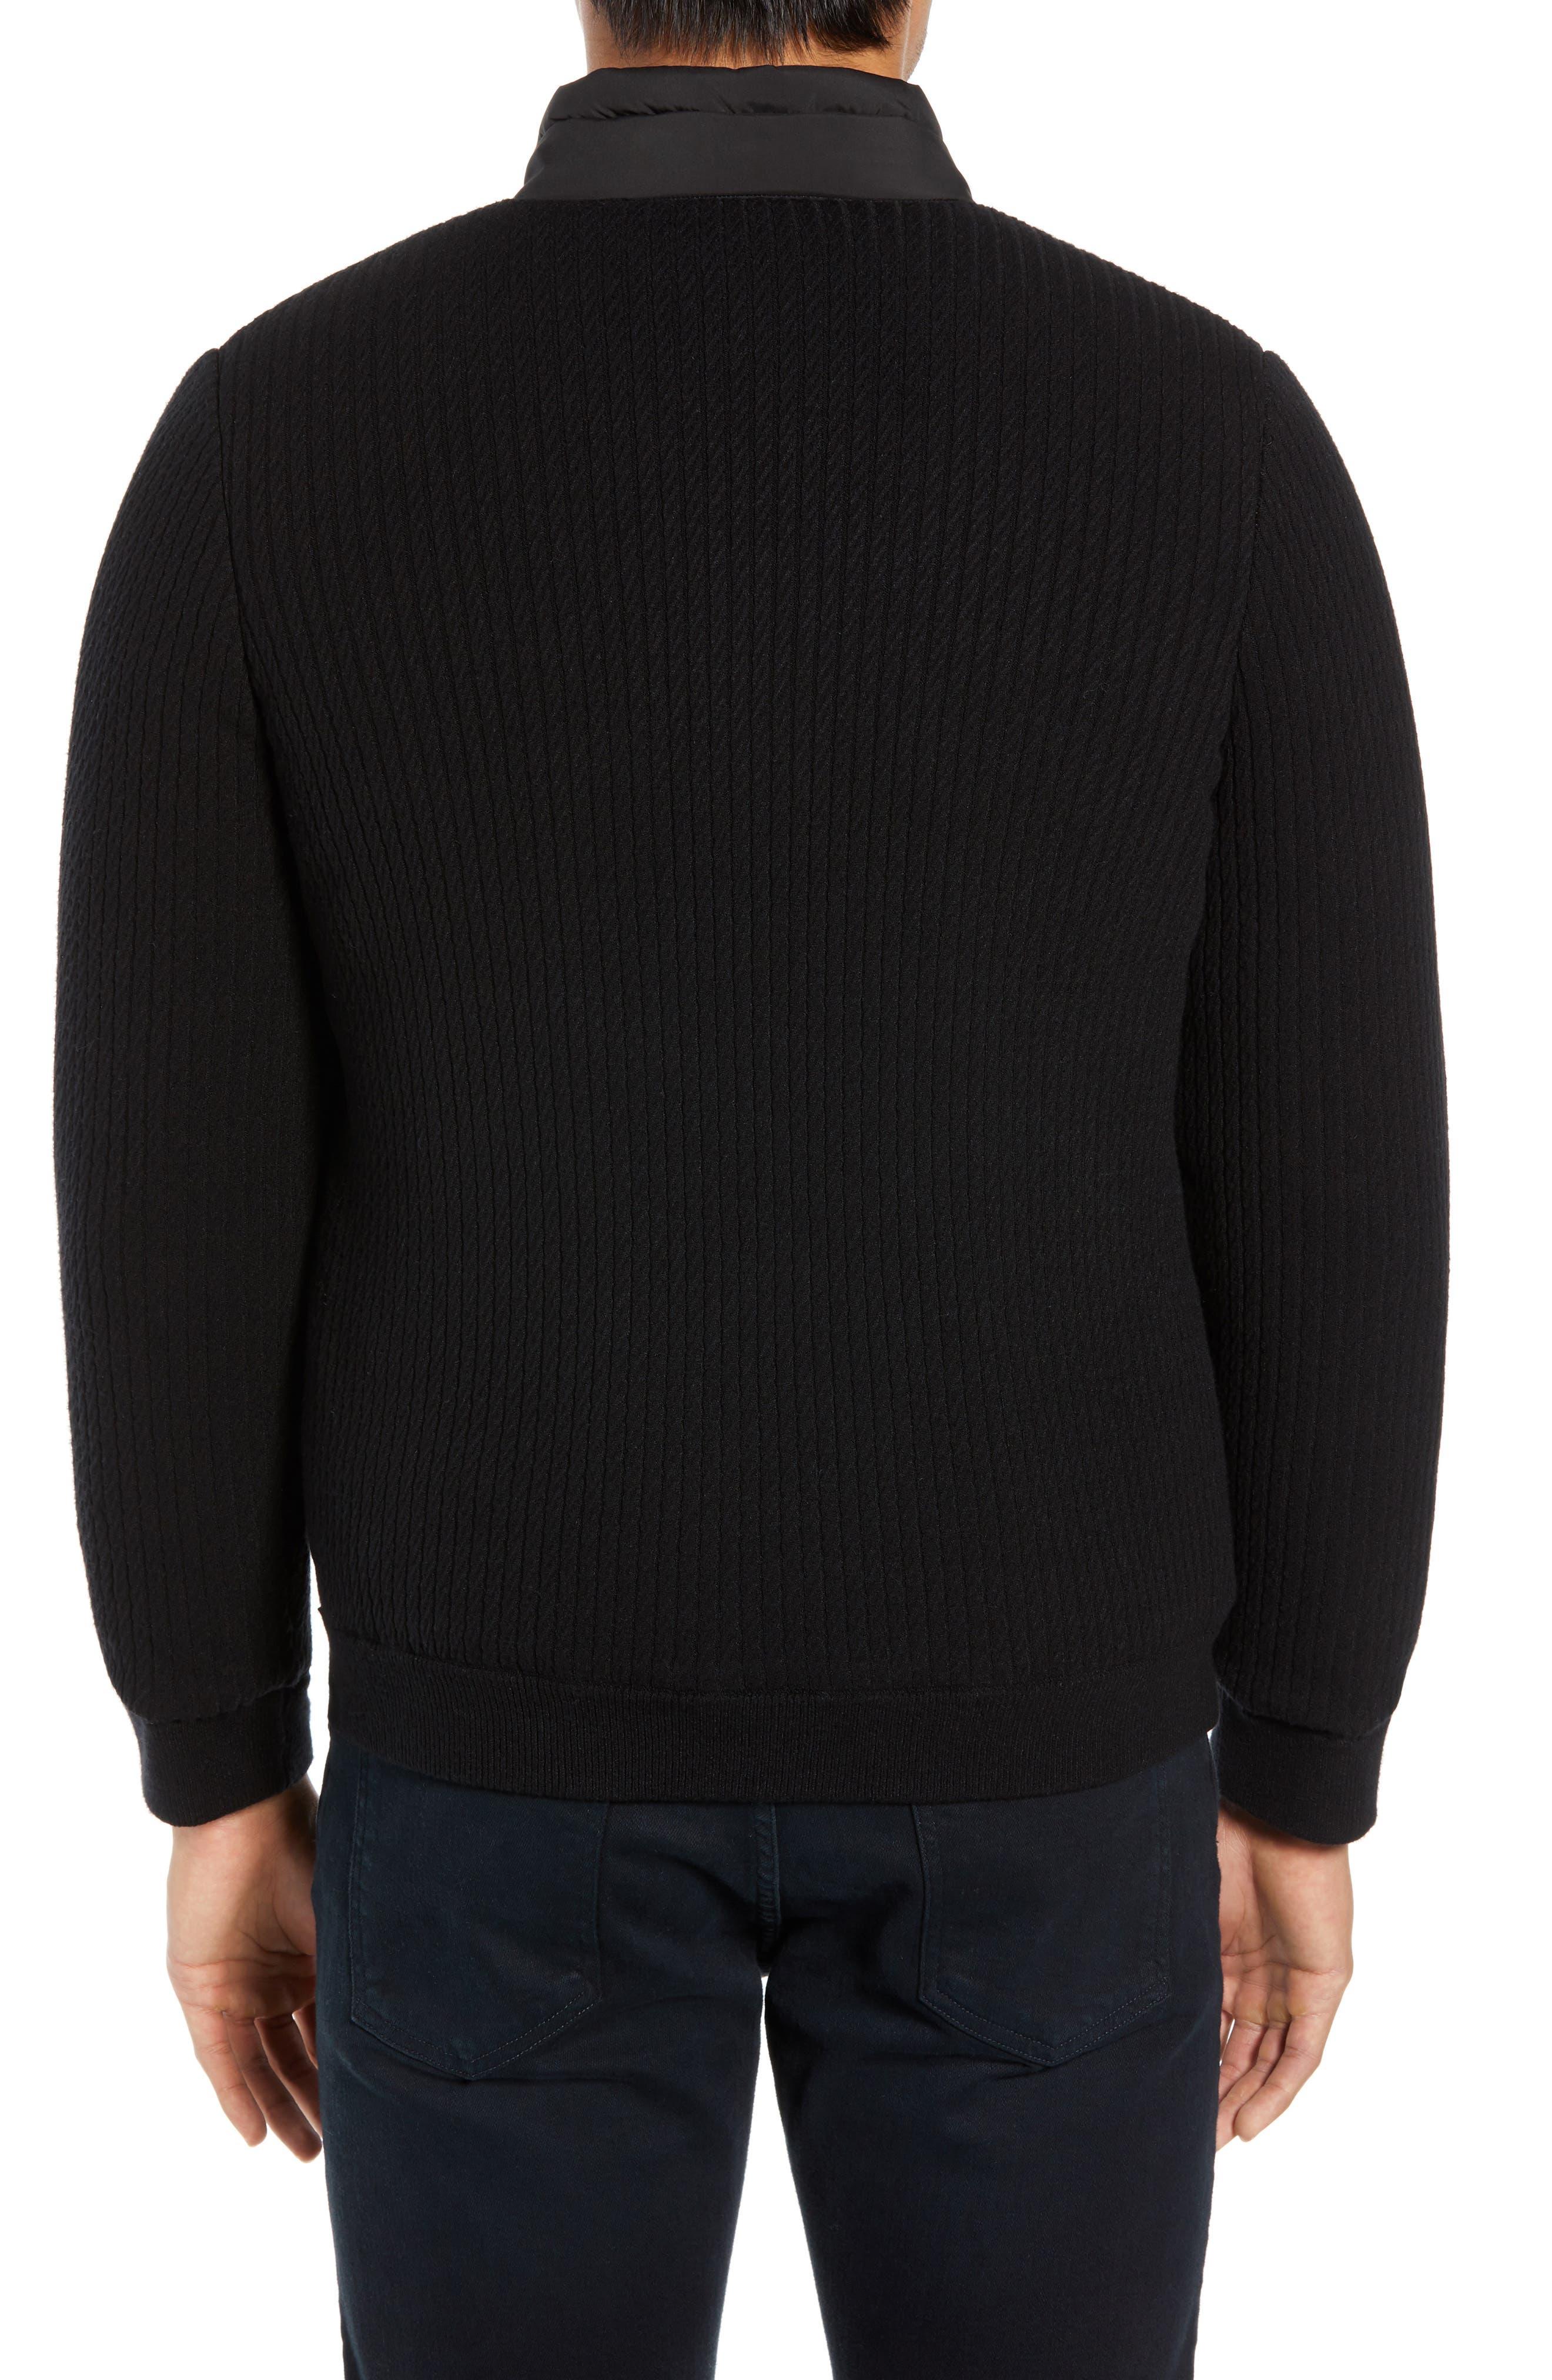 ZACHARY PRELL,                             Federal Jacket,                             Alternate thumbnail 2, color,                             BLACK